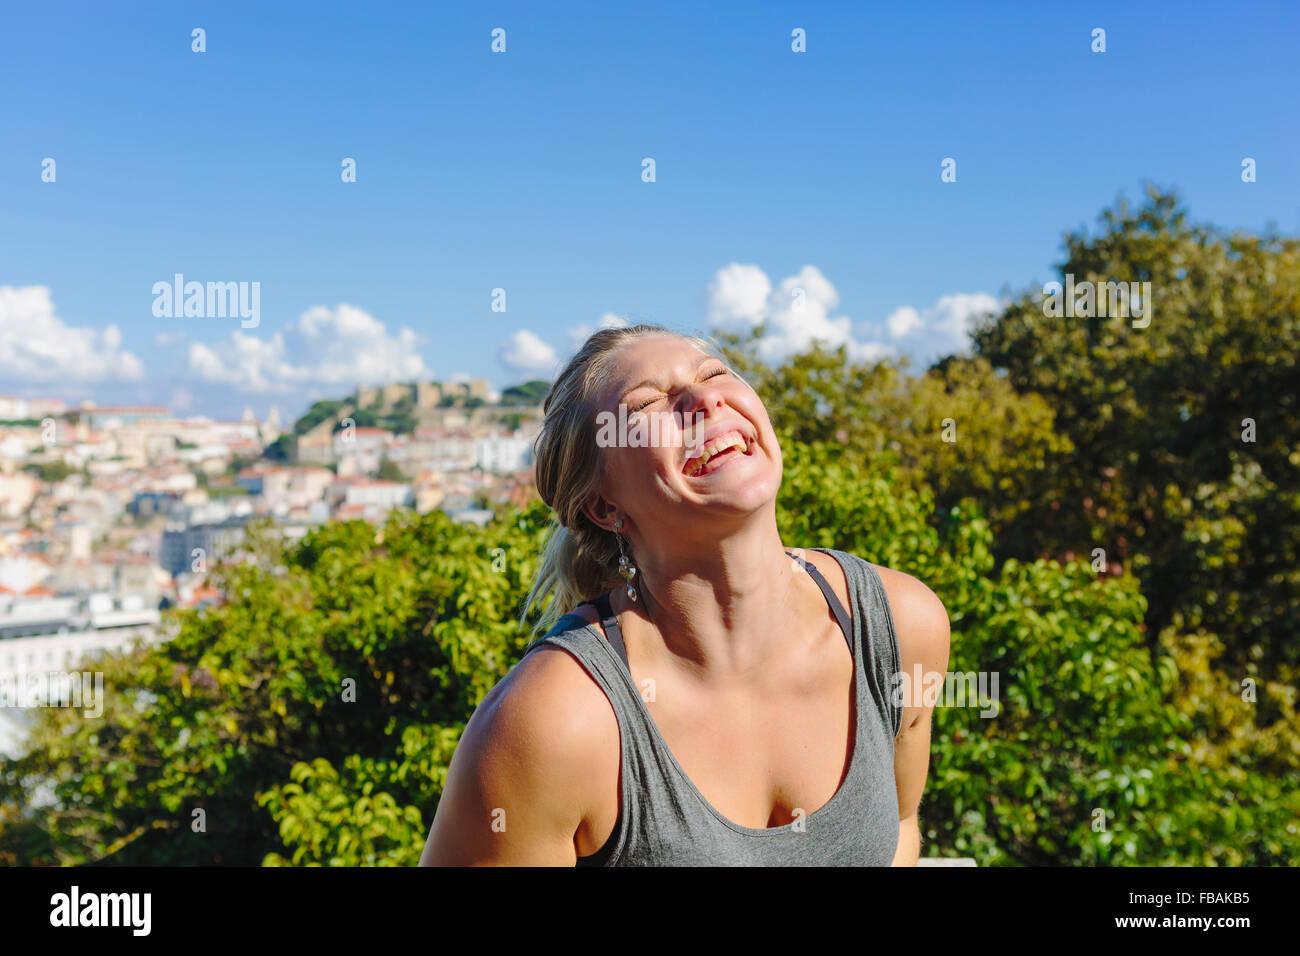 Portugal, Lisboa, Retrato de mujer joven riendo Imagen De Stock